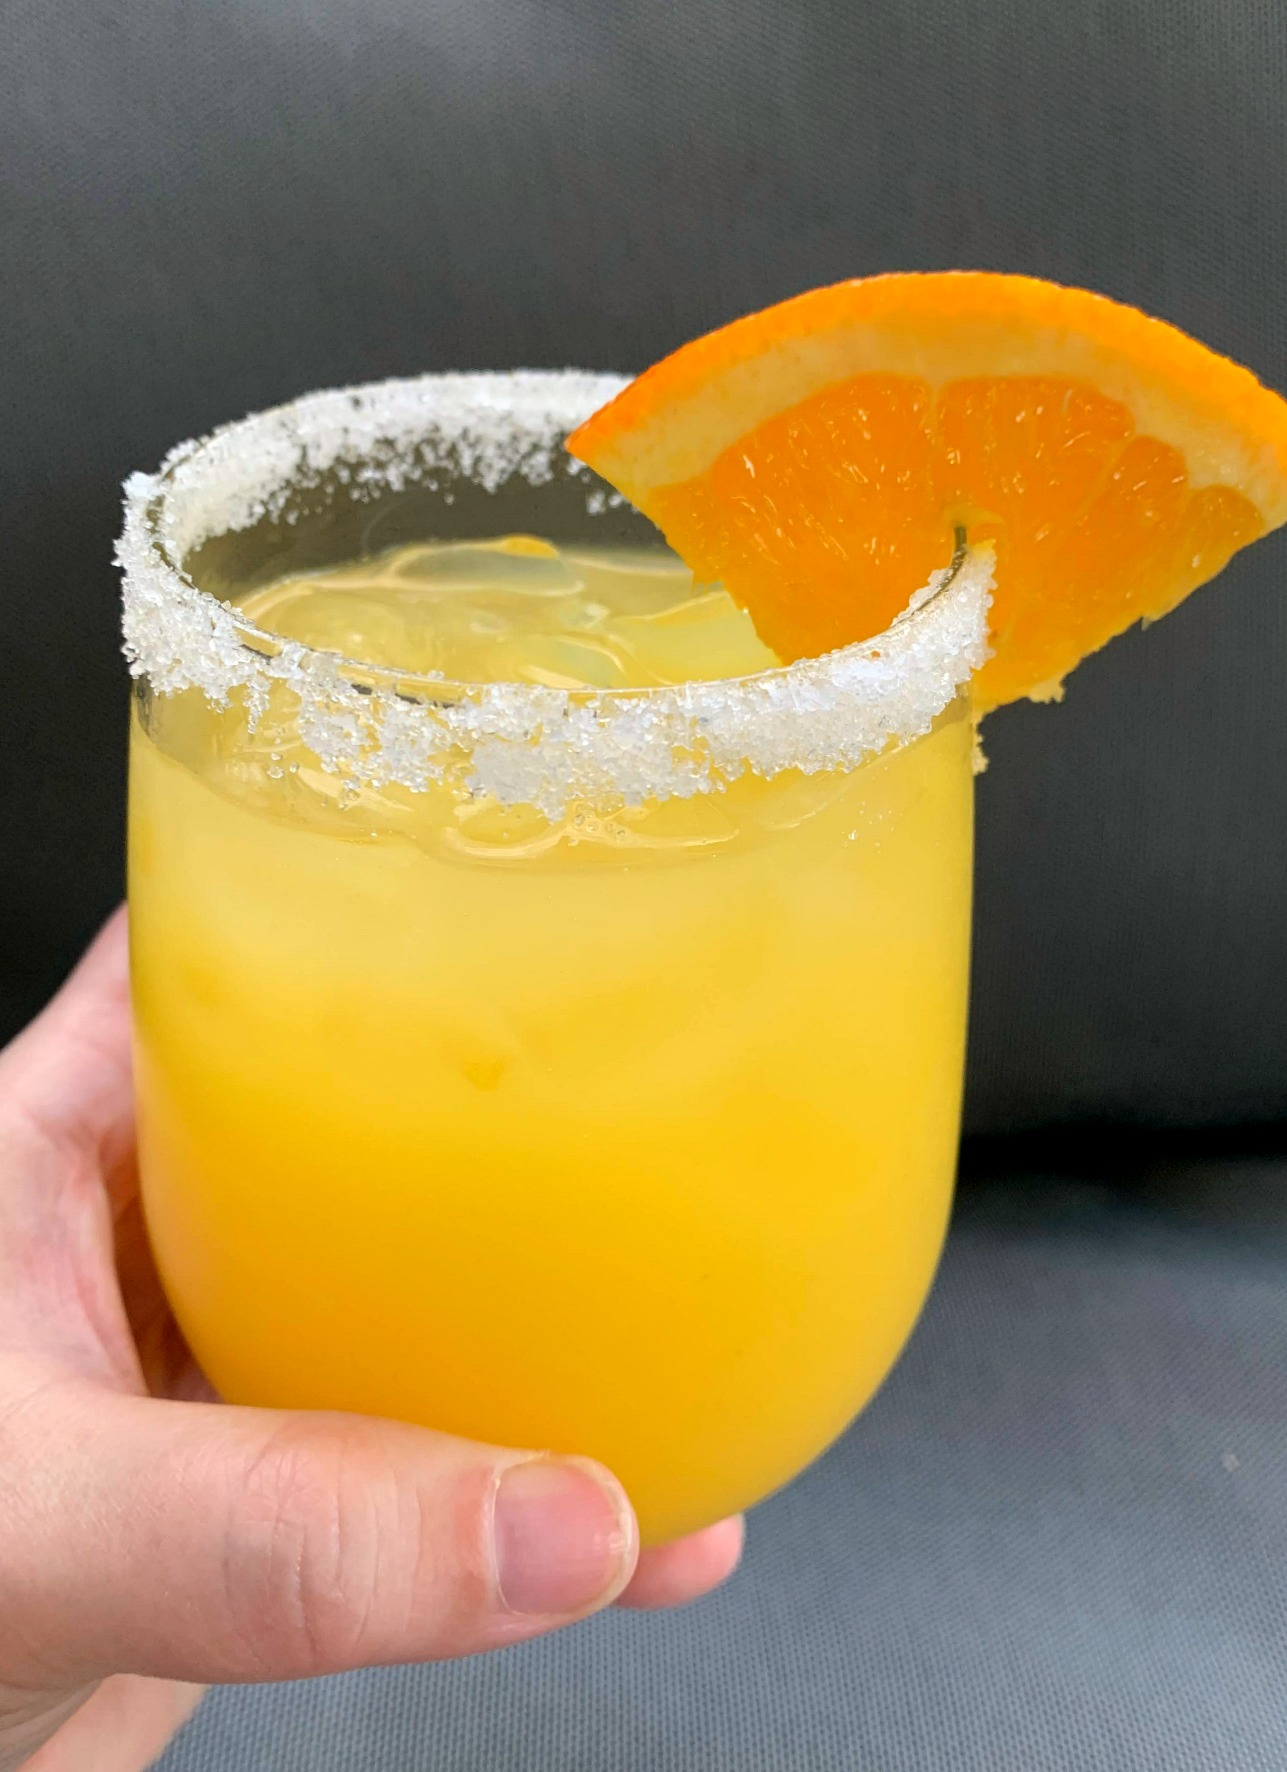 Orange Margarita with a sugar rim and wedge of orange